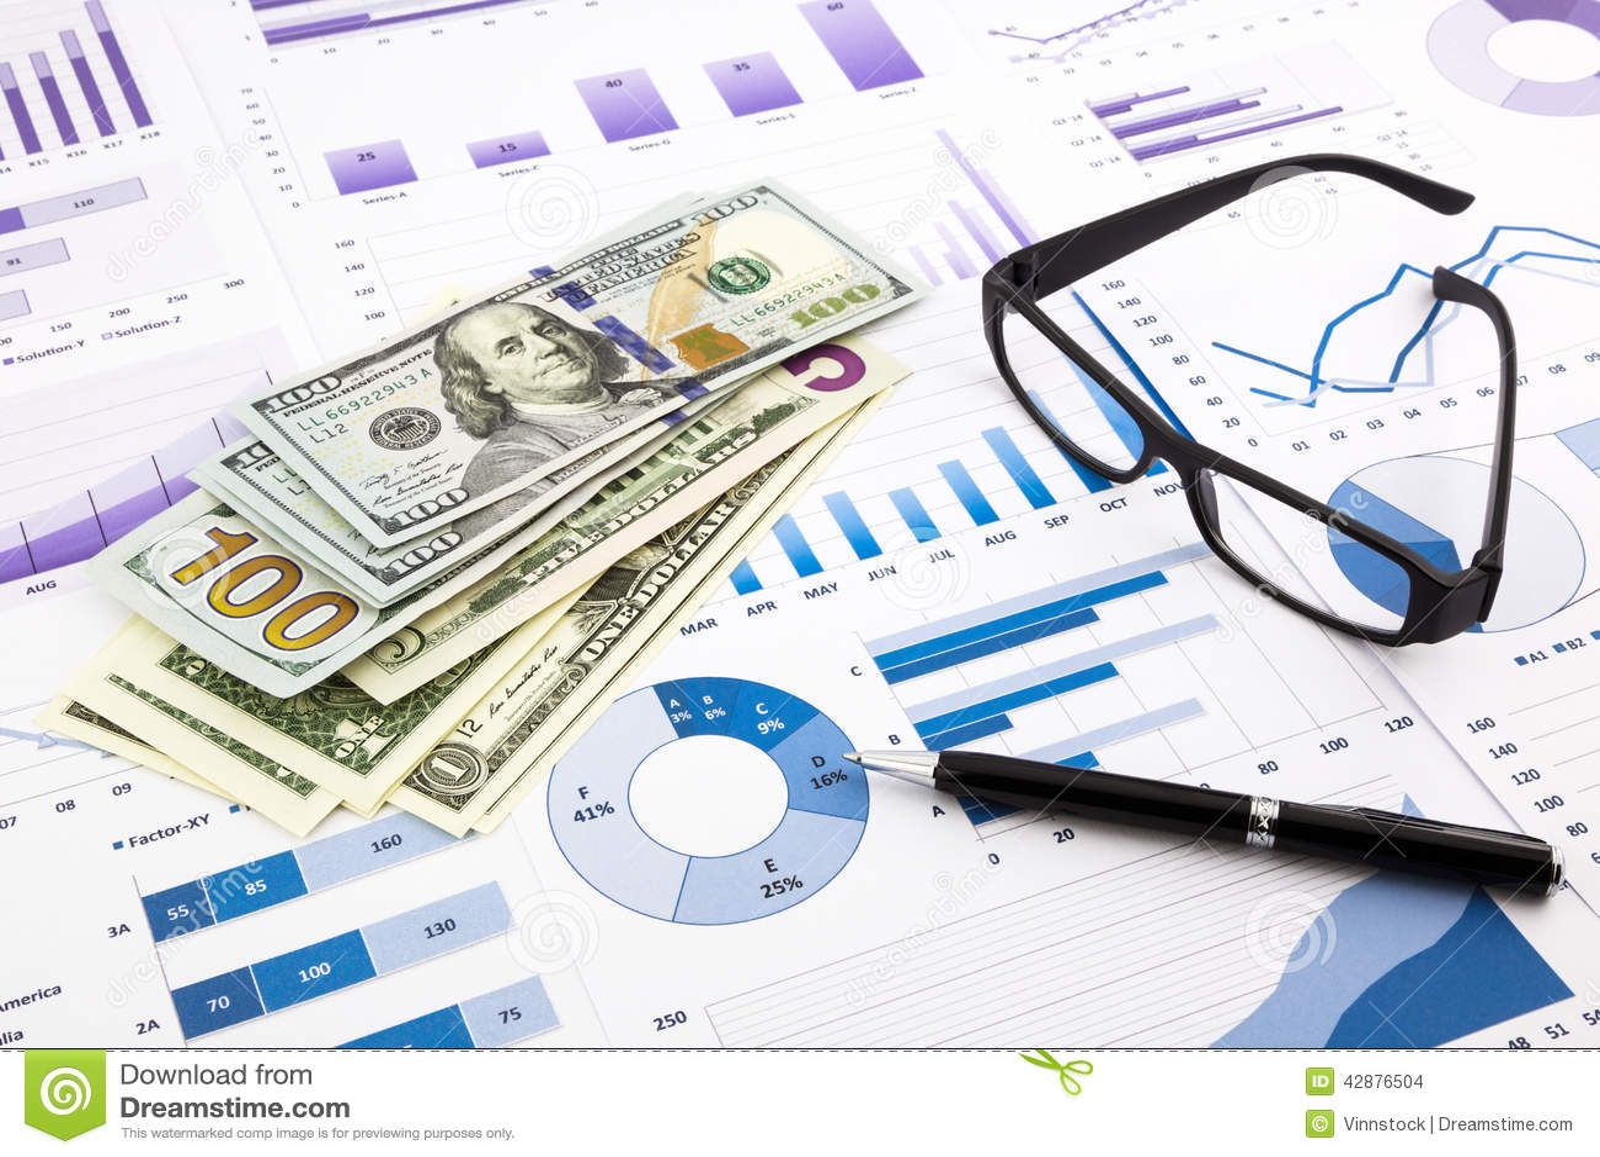 A Sample Bureau De Change Business Plan Template